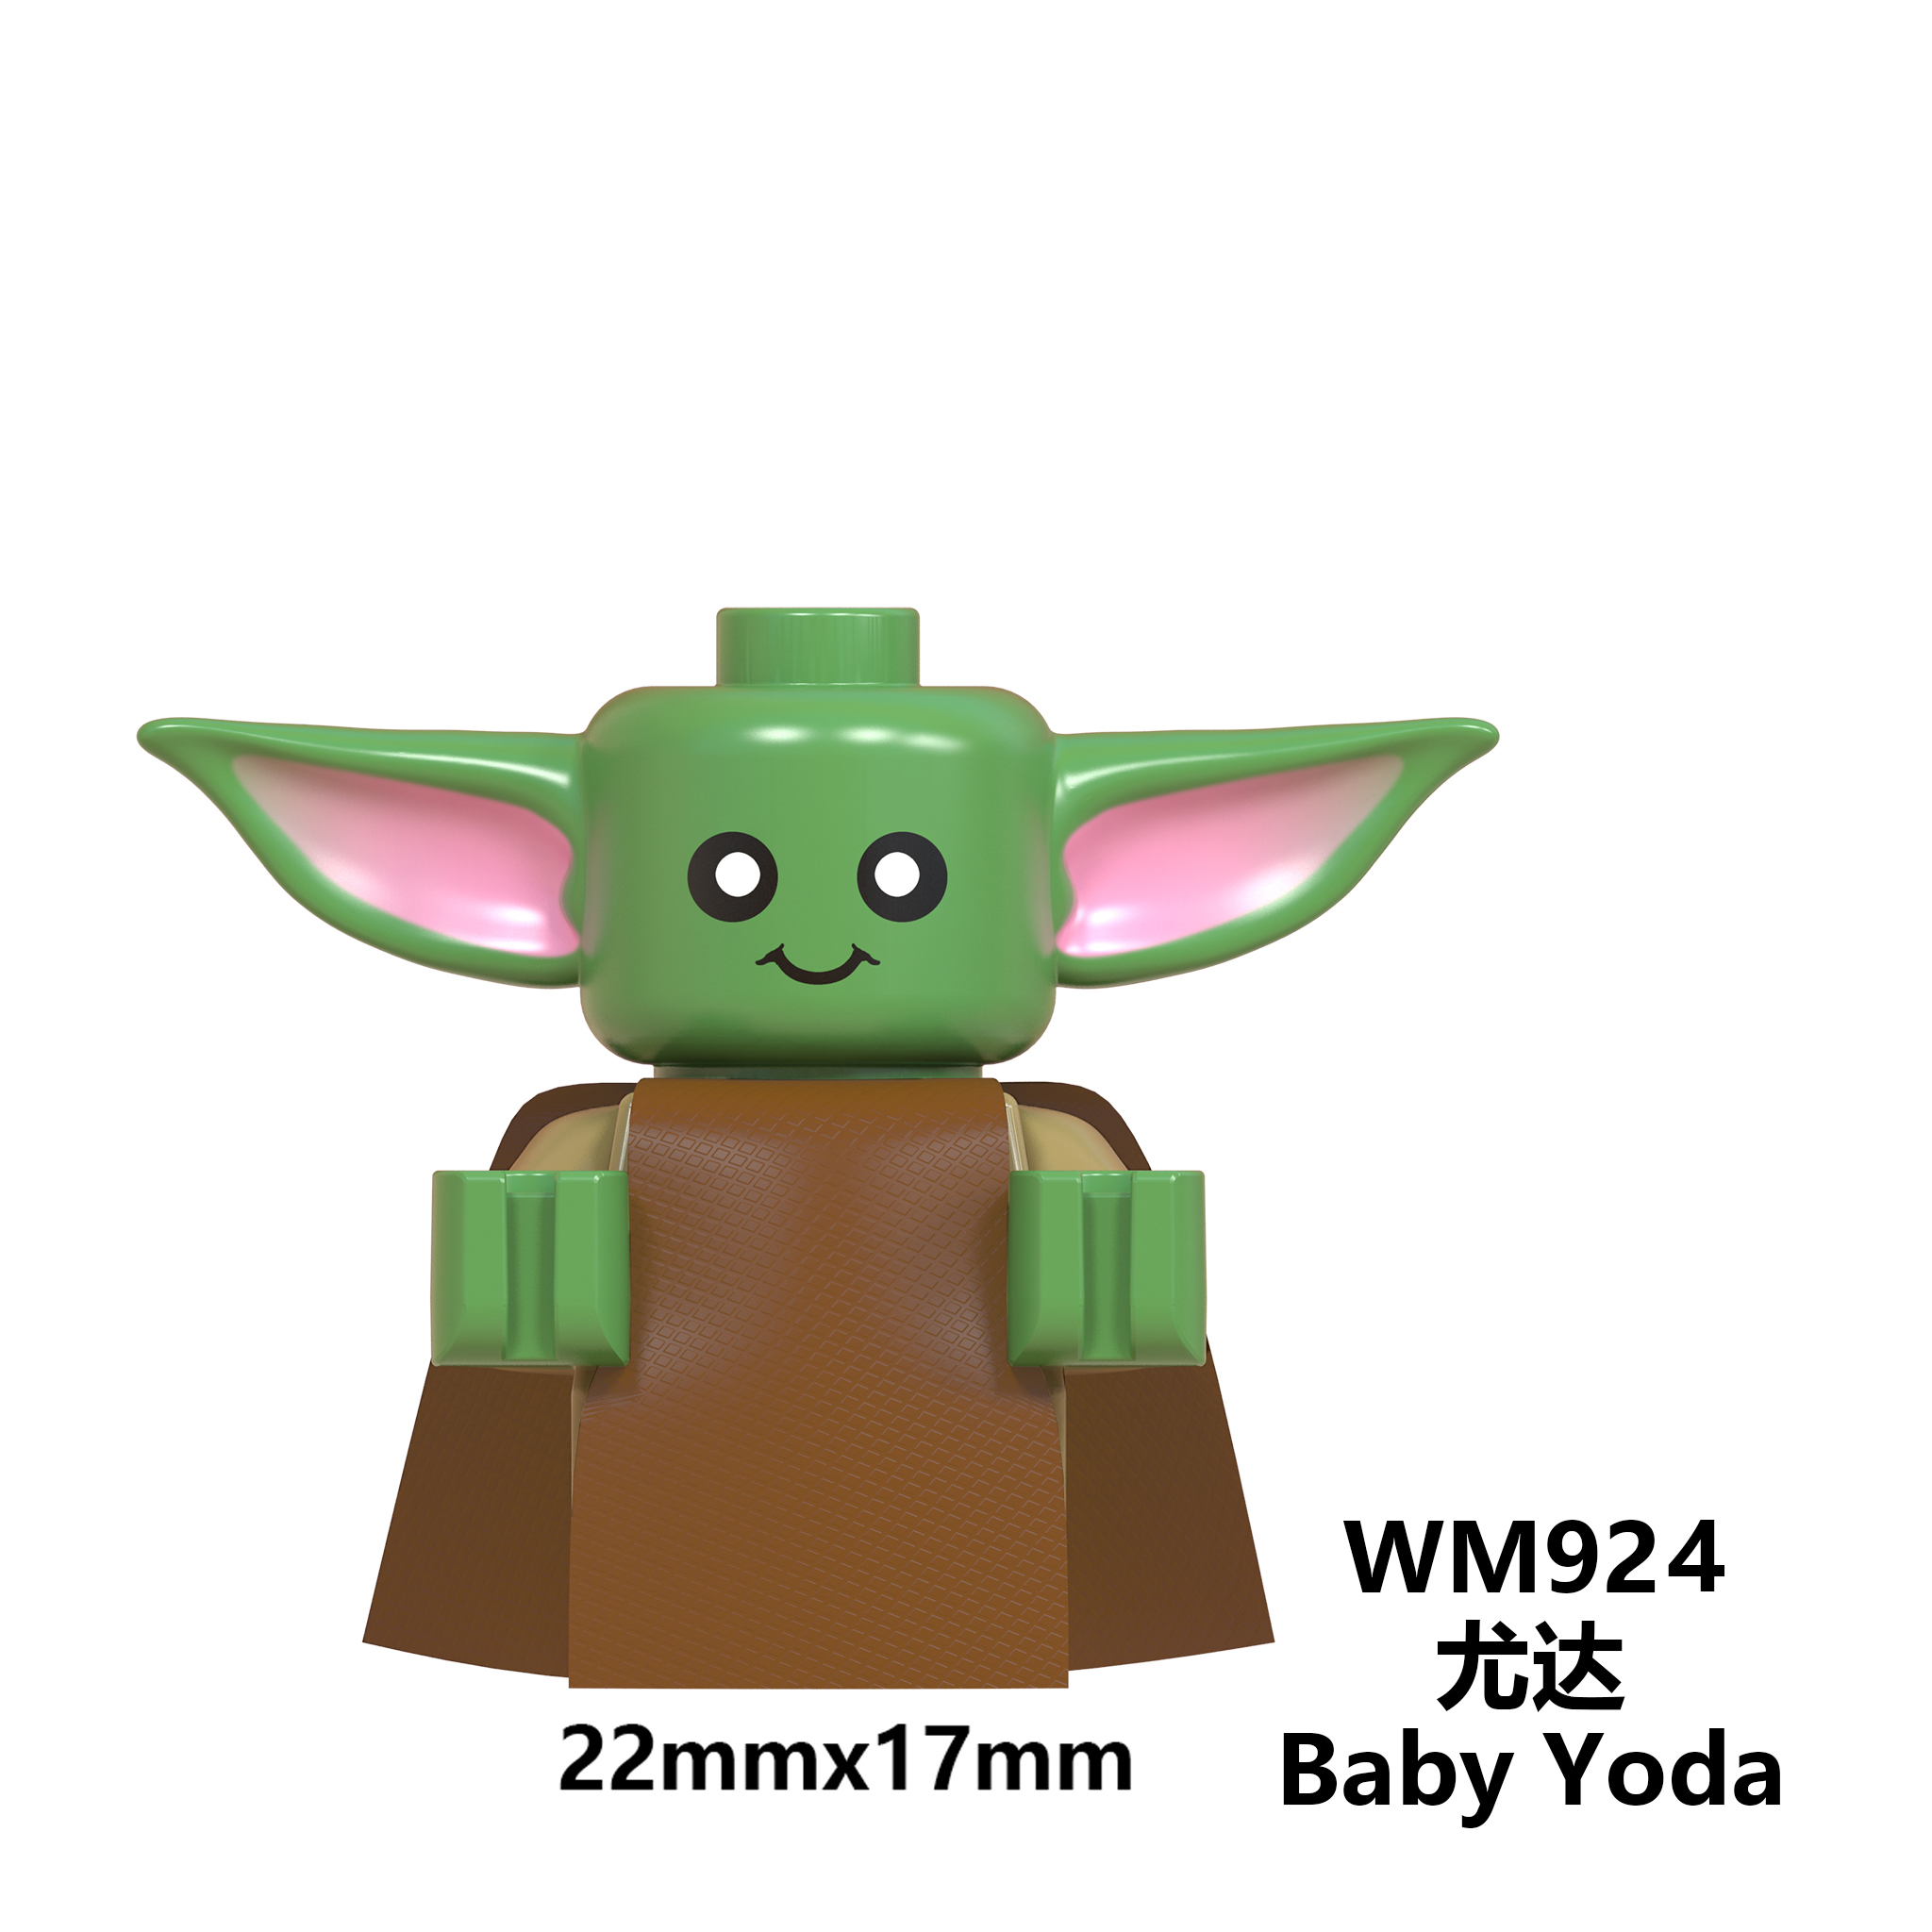 baby Yoda Mandalorian  naves Star  rise of skywalker Wars 9 Kylo Rened starwars Building Blocks Toys|Blocks| |  - title=